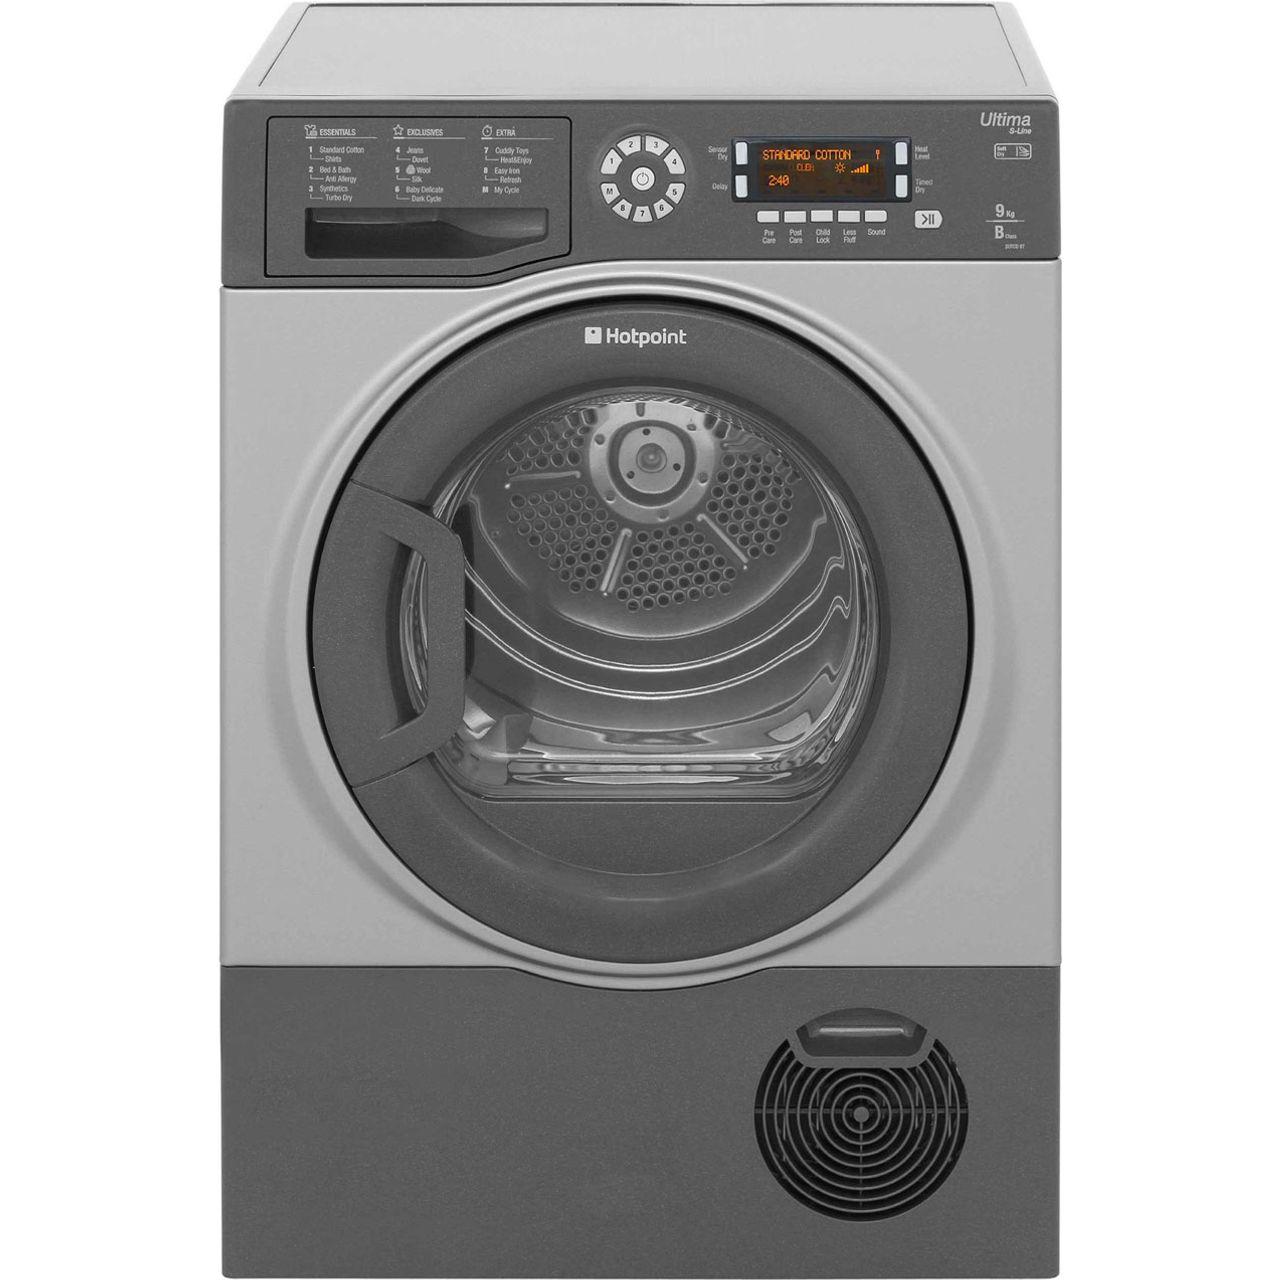 Hotpoint Ultima S-Line SUTCD97B6GM Condenser Tumble Dryer